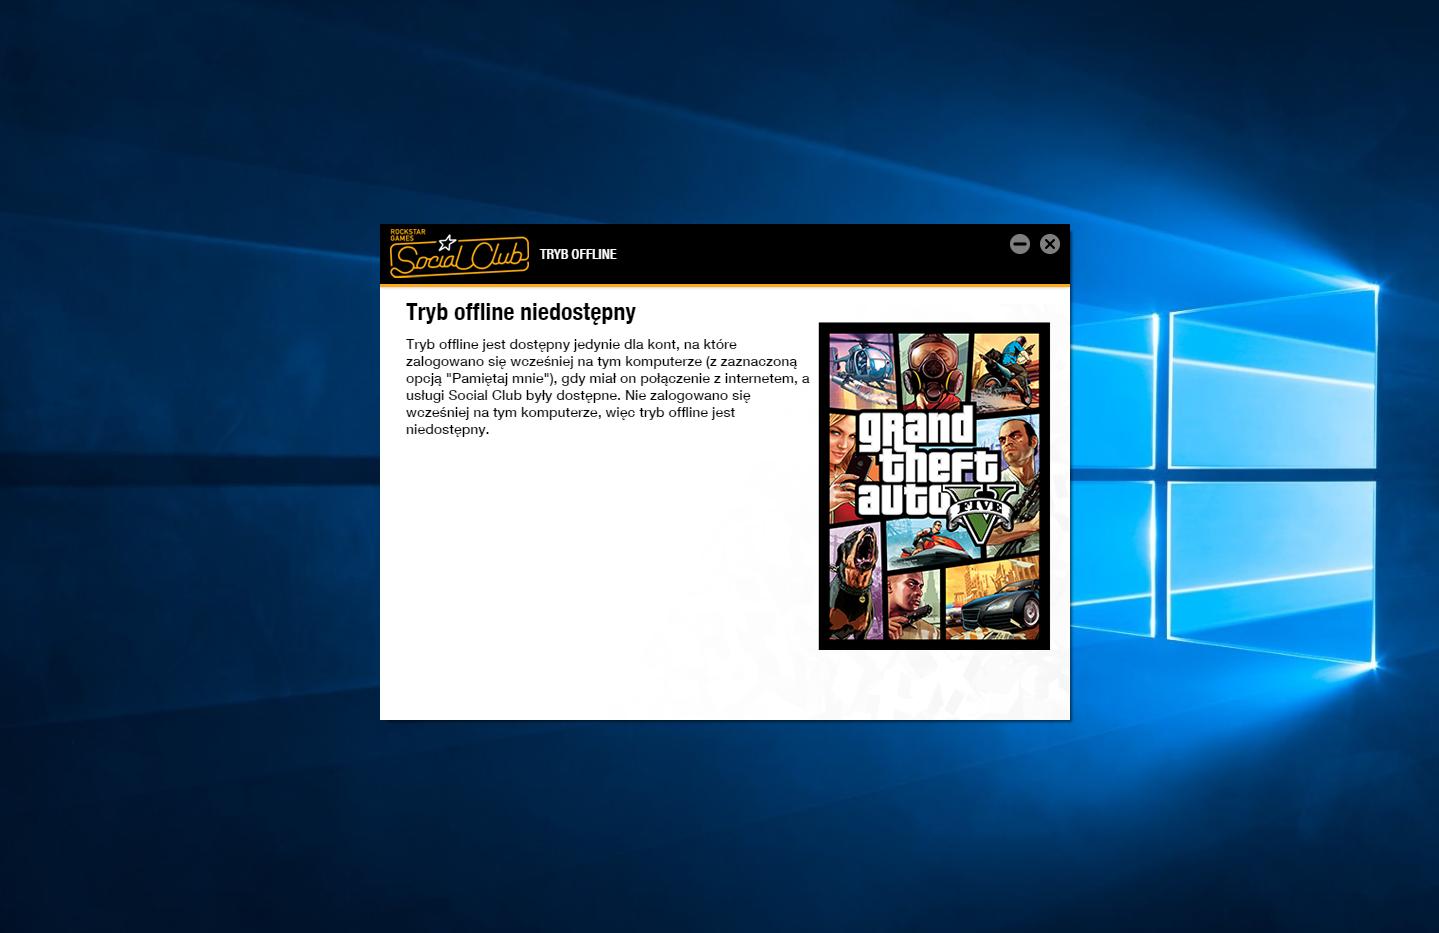 Social club download gta 5 windows 10 | GTA 5 Download for PC/Laptop